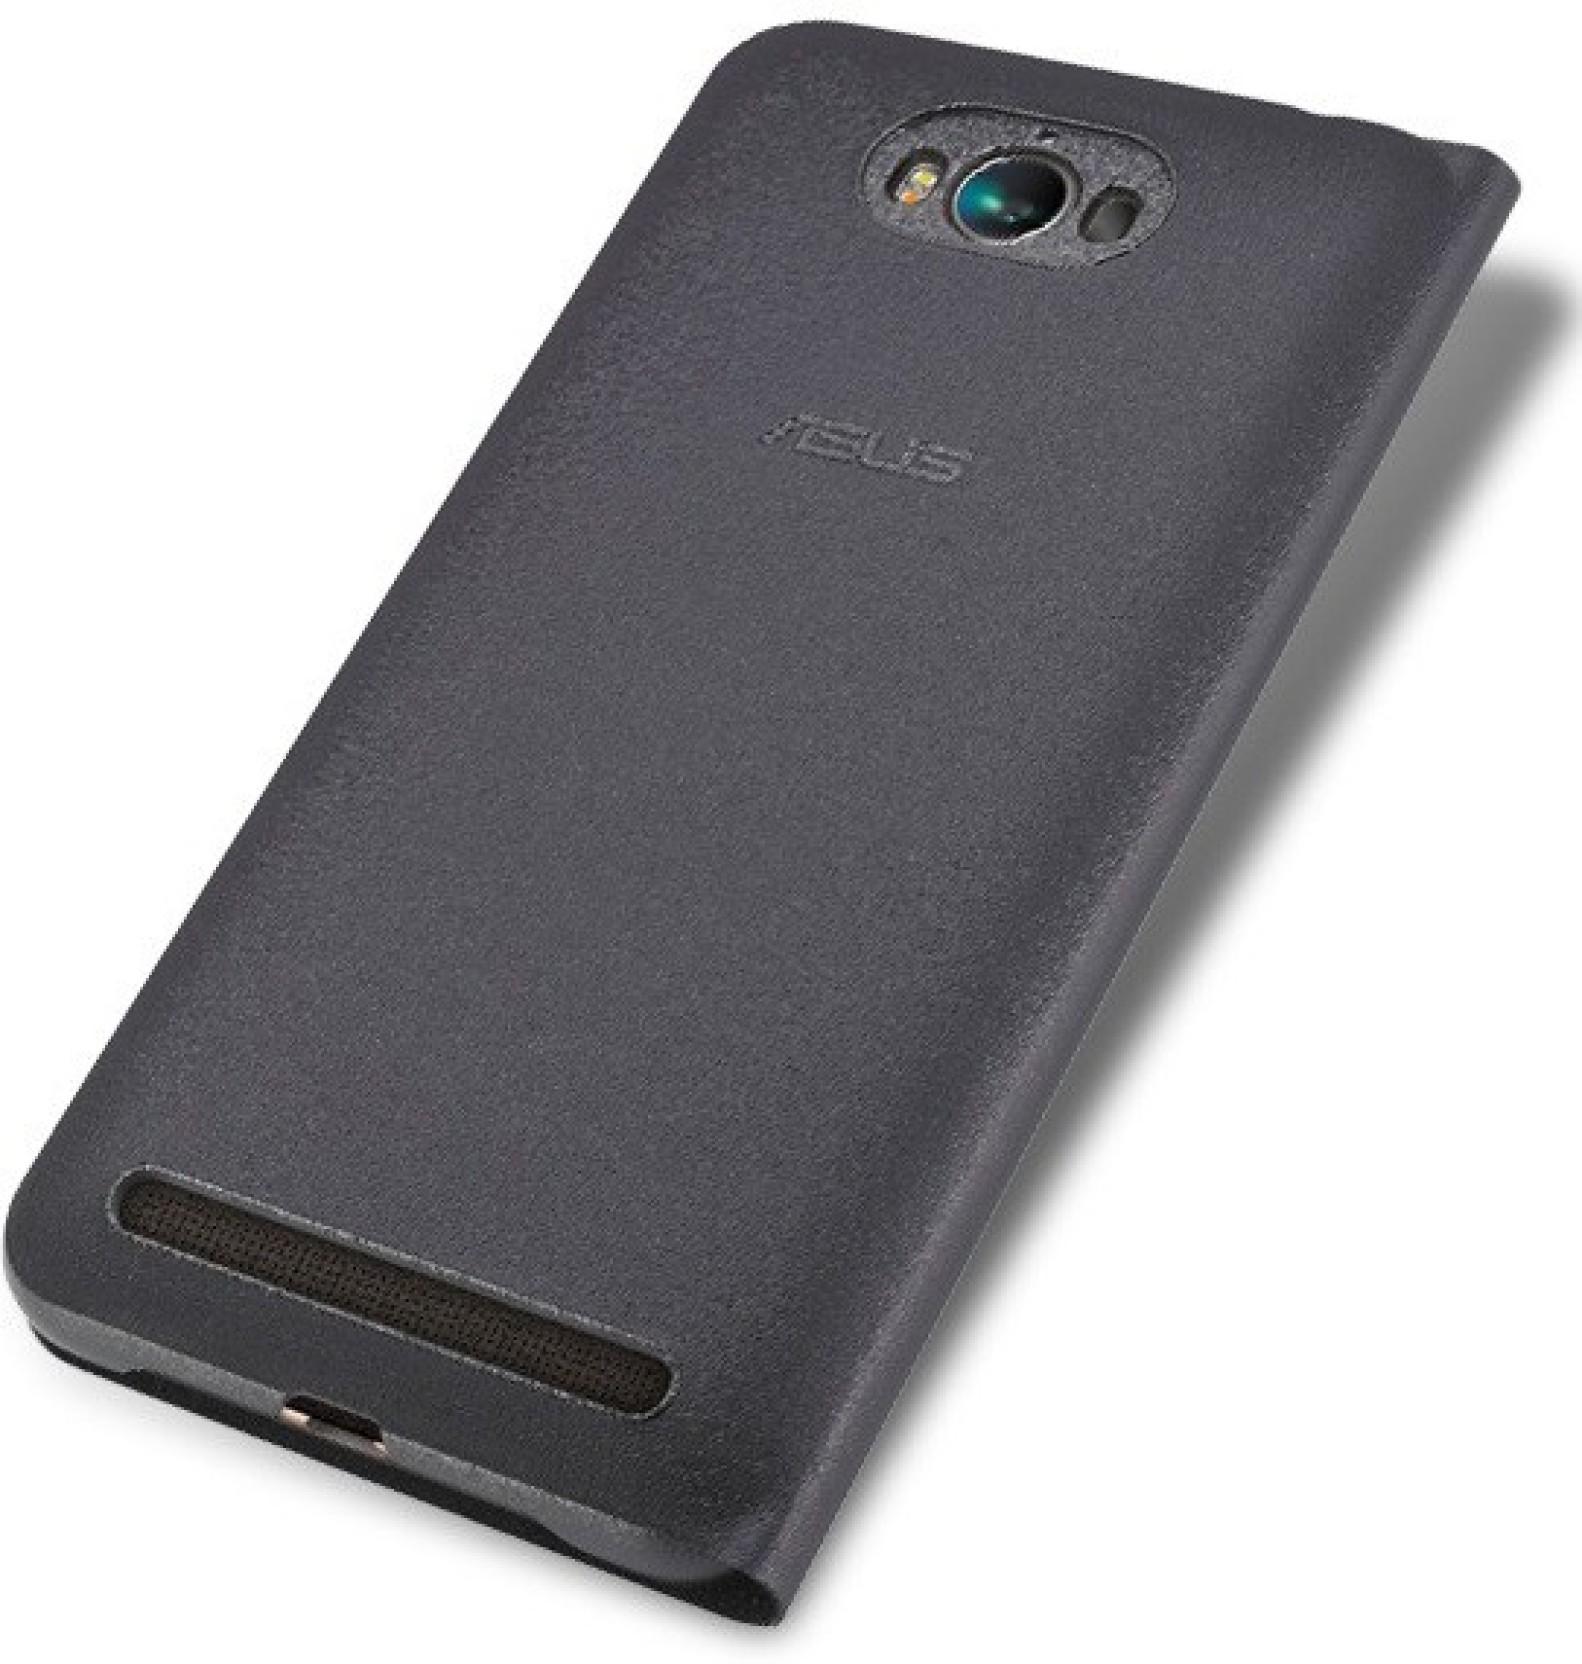 Kdrock Flip Cover For Asus Zenfone Max Zc550kl 2 32gb Black Share